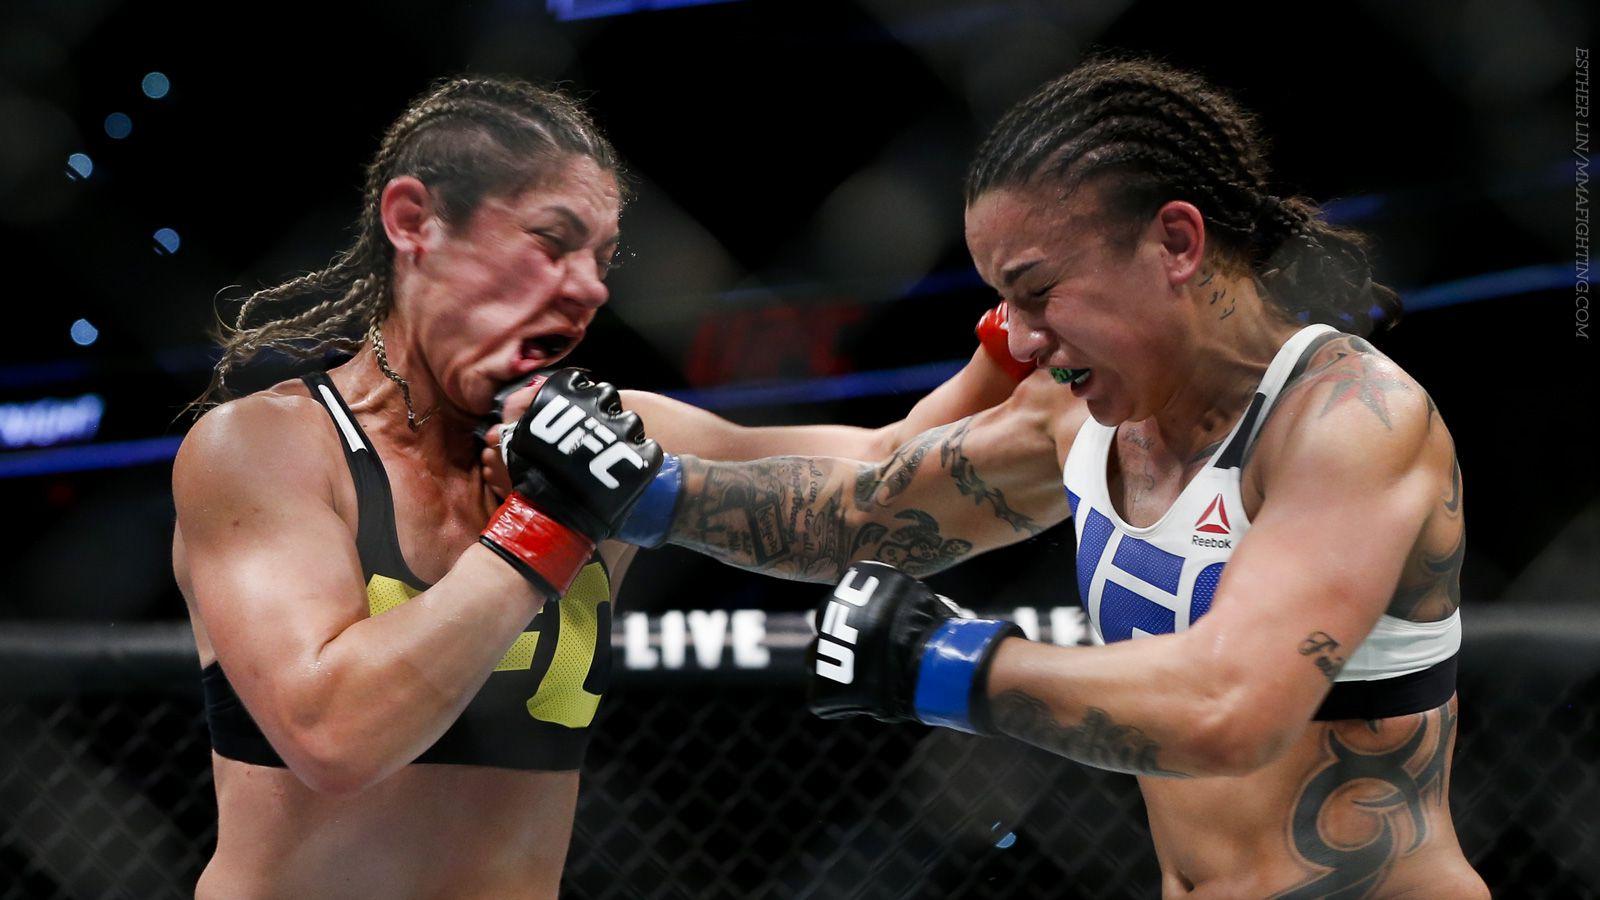 UFC on FOX 19 results: Raquel Pennington wins close one over